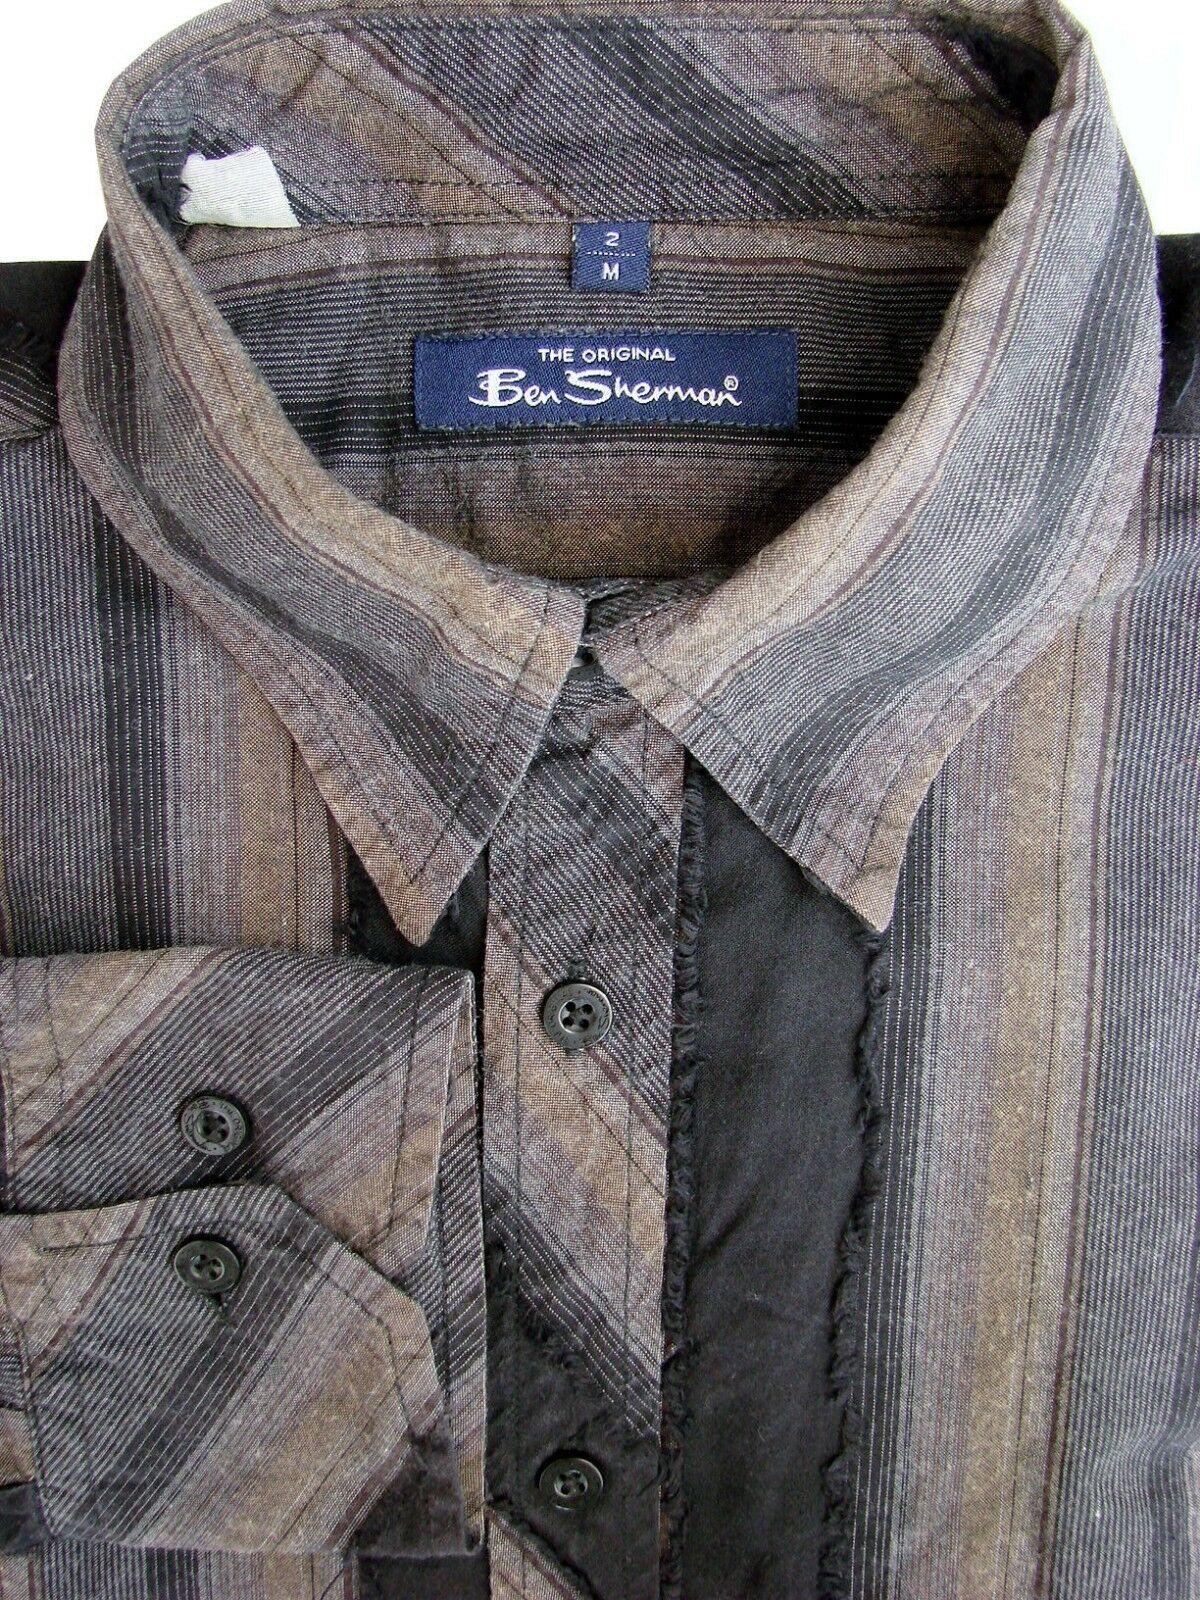 9e80d5c198 BEN SHERMAN Shirt Mens 15 M Black Grey   Brown Stripes - TEXTURED ...